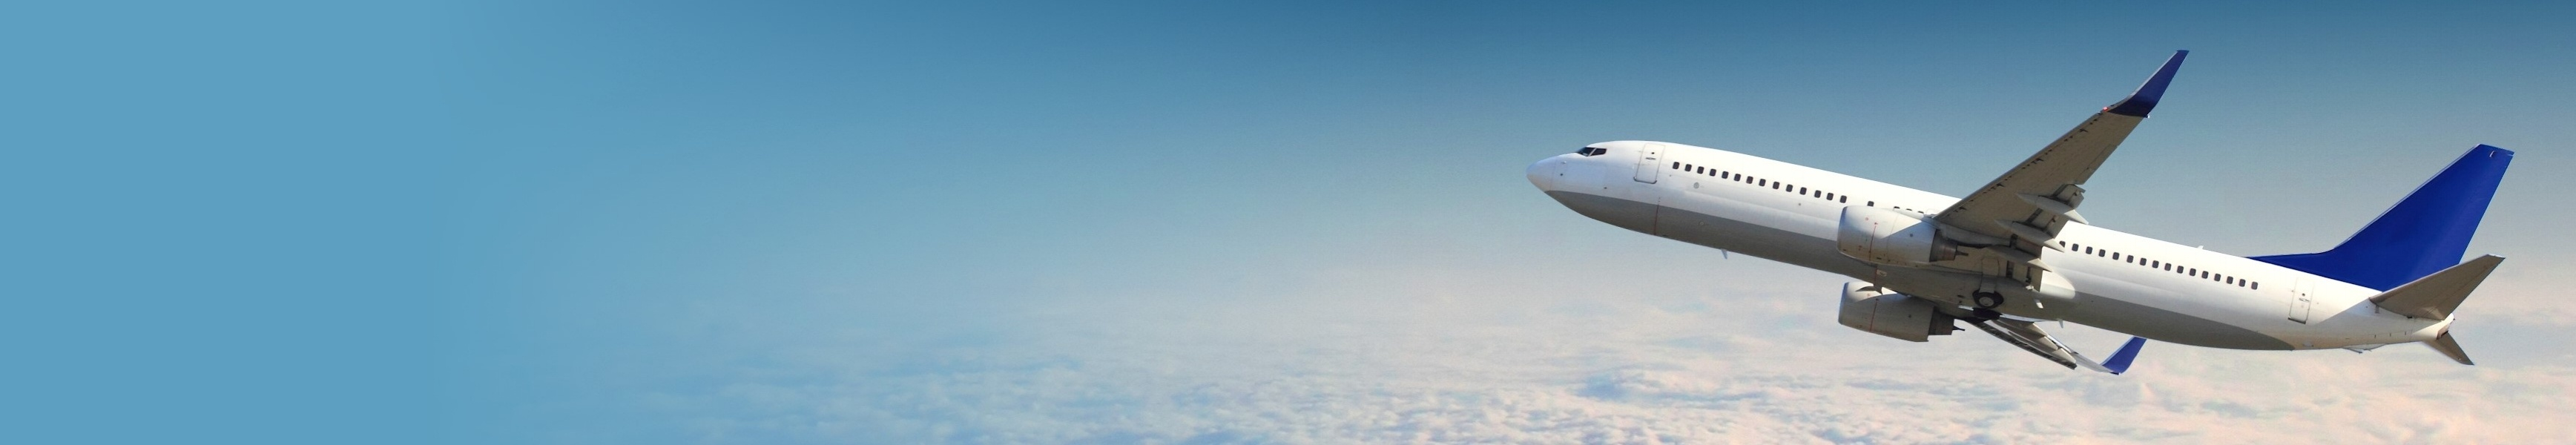 Air Freight Banner-770620-edited.jpg